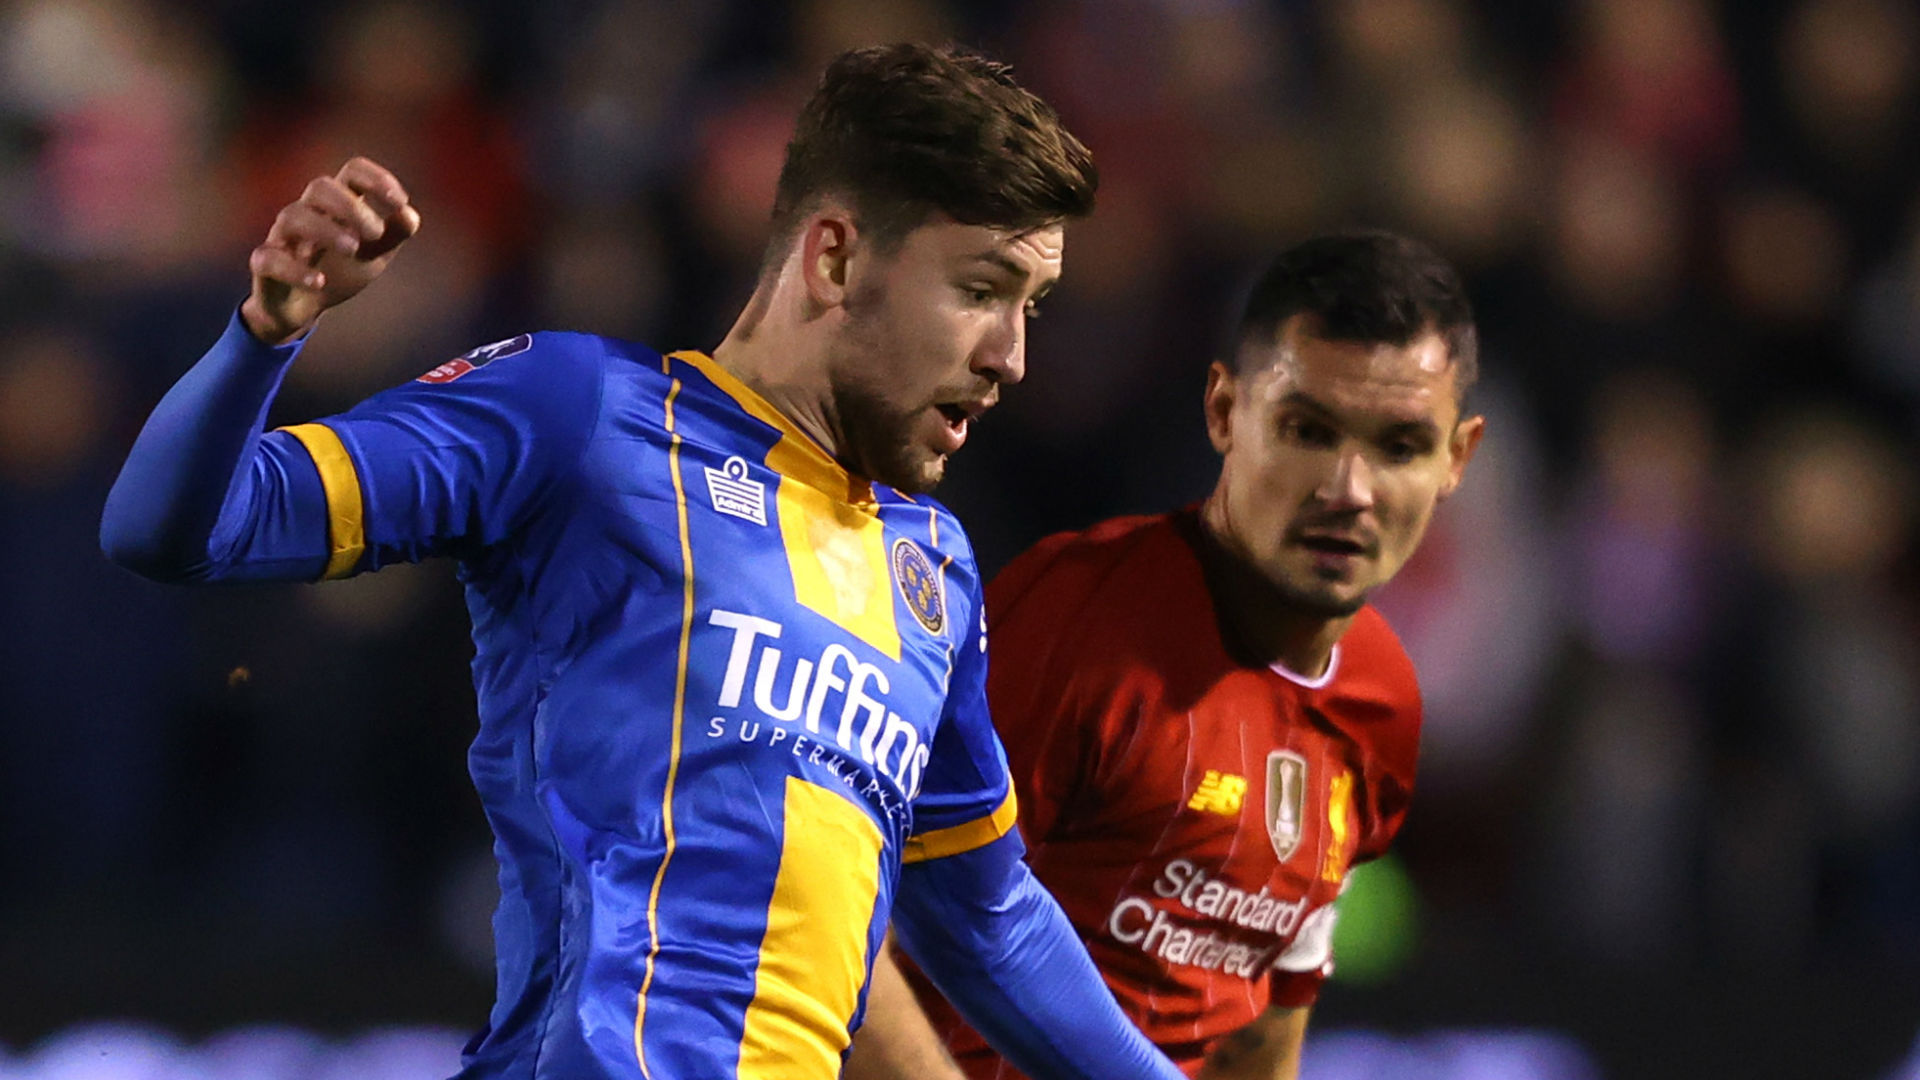 Shrewsbury-Liverpool (2-2) - Les Reds accrochés et condamnés au replay